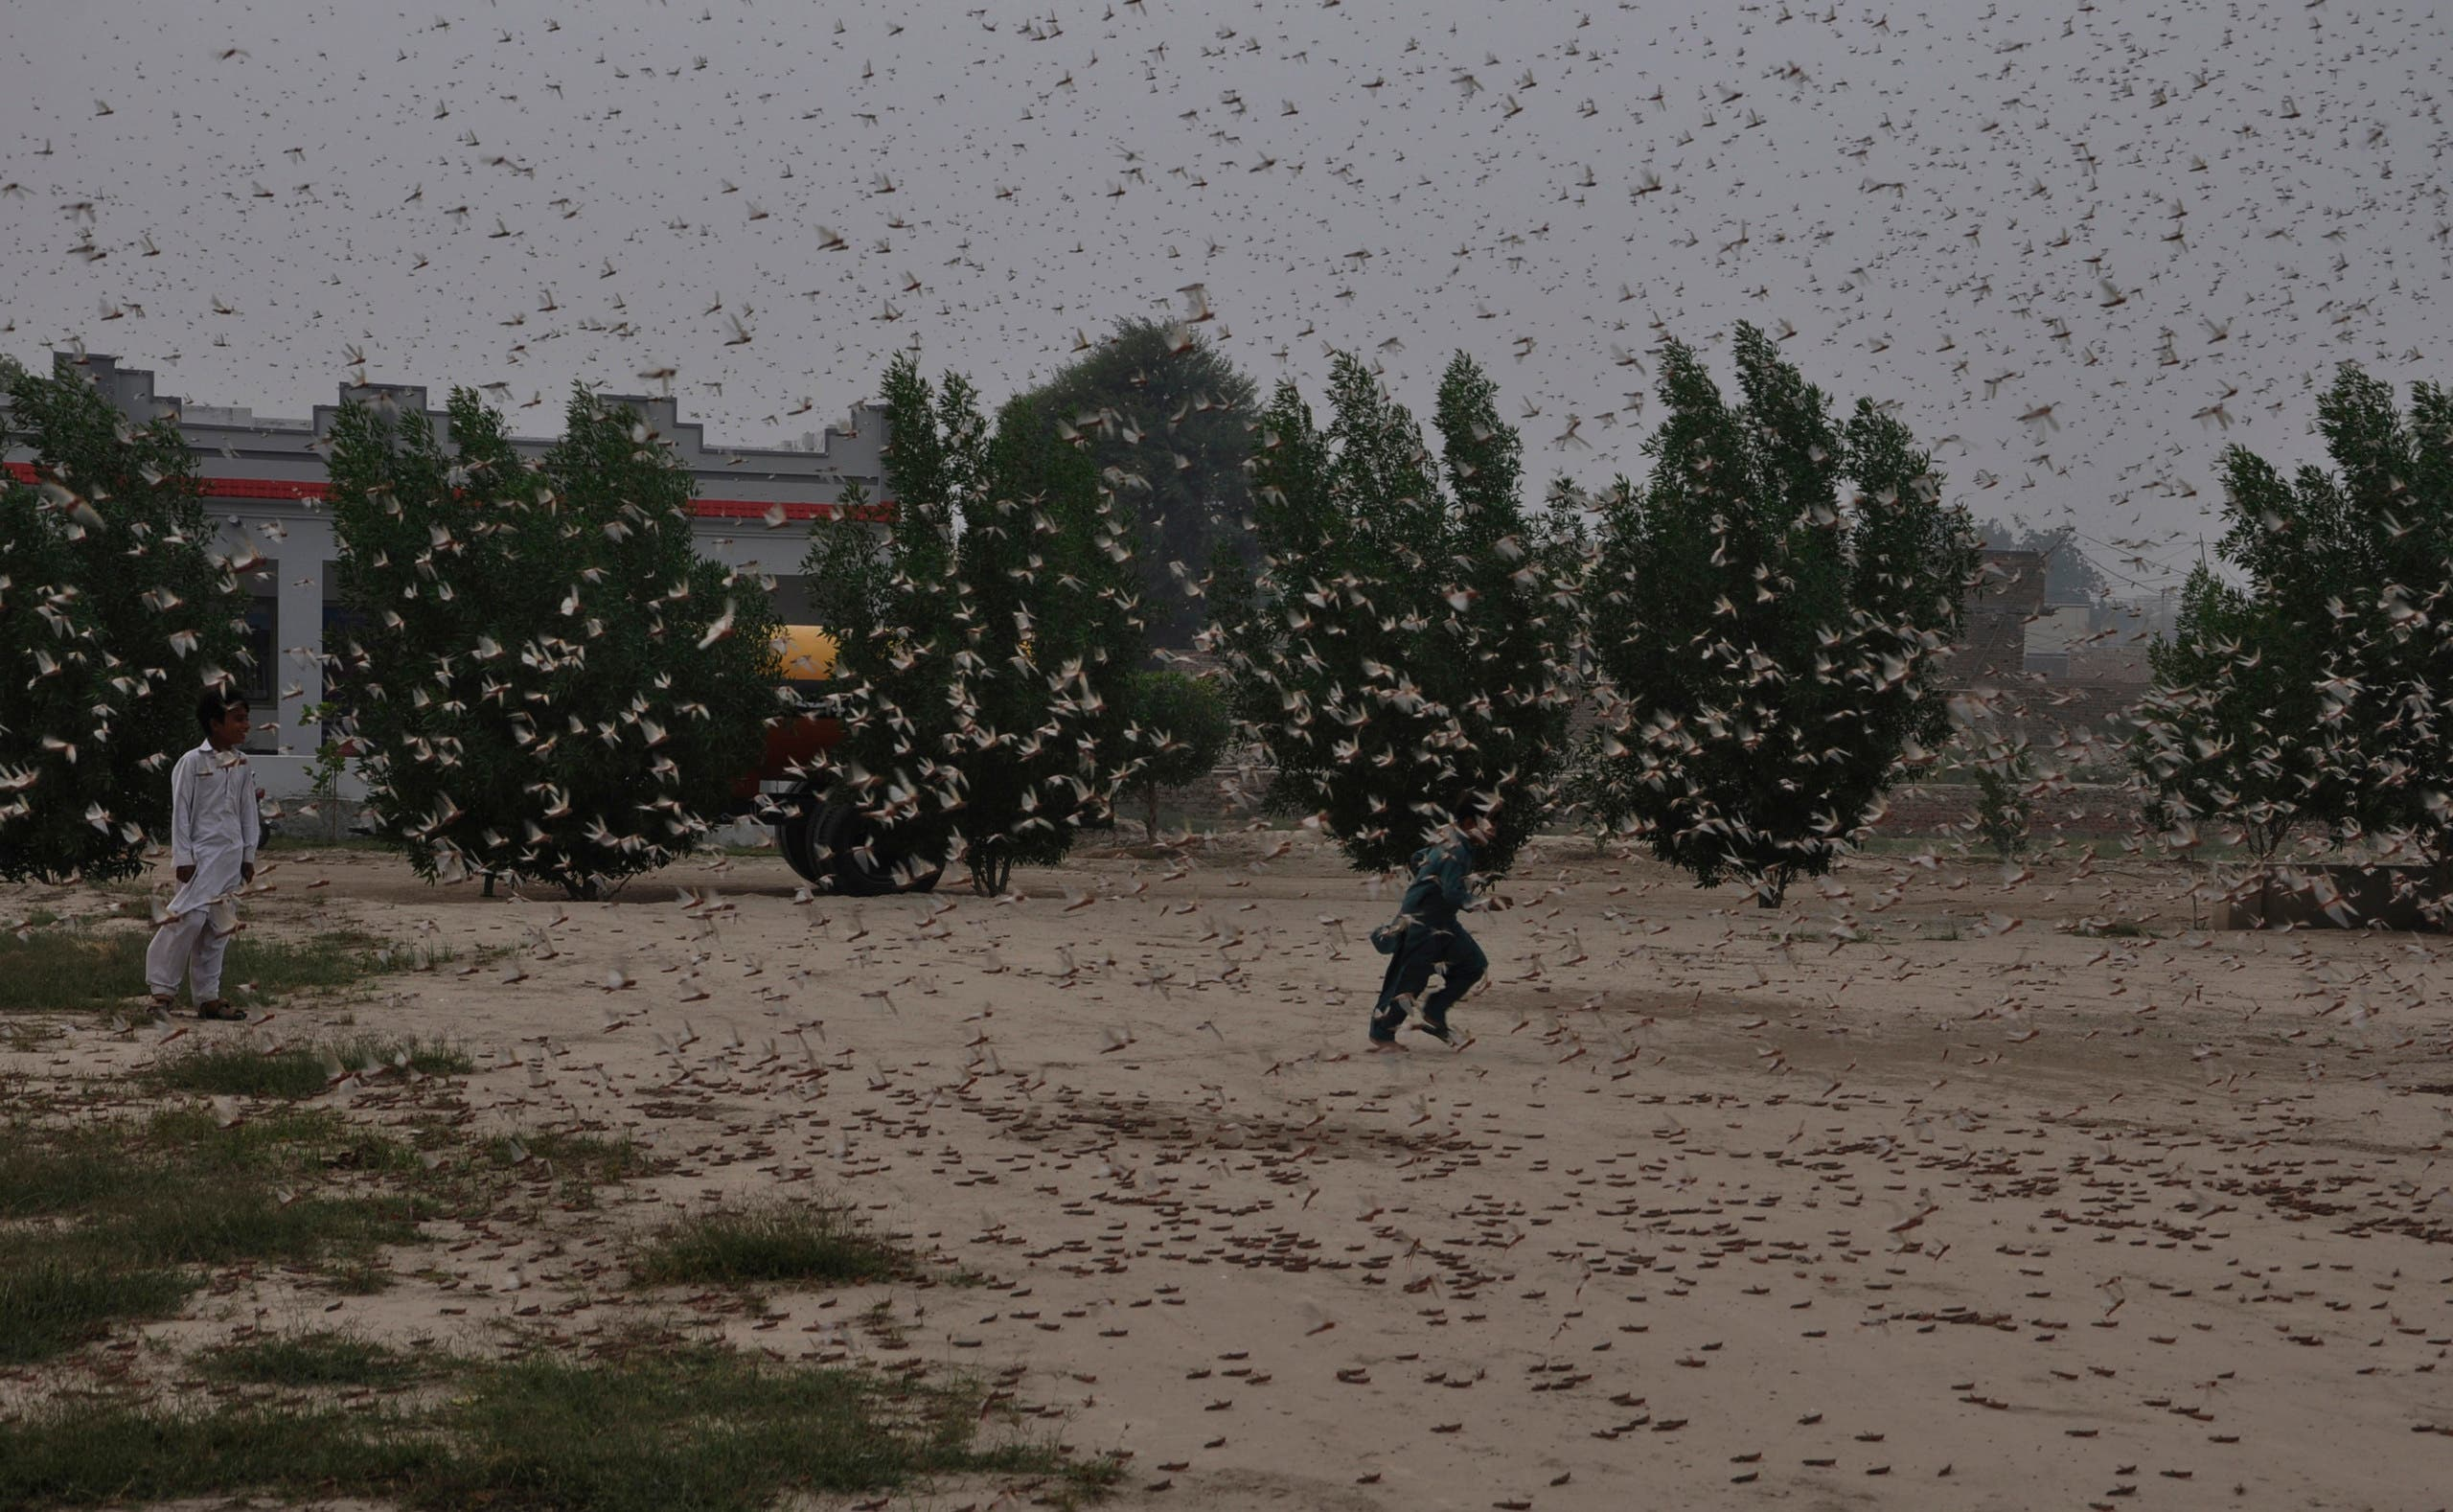 Pakistani children try to avoid locusts swarming in Rahimyar Khan, Pakistan, on Wednesday, November 13, 2019. (AP)